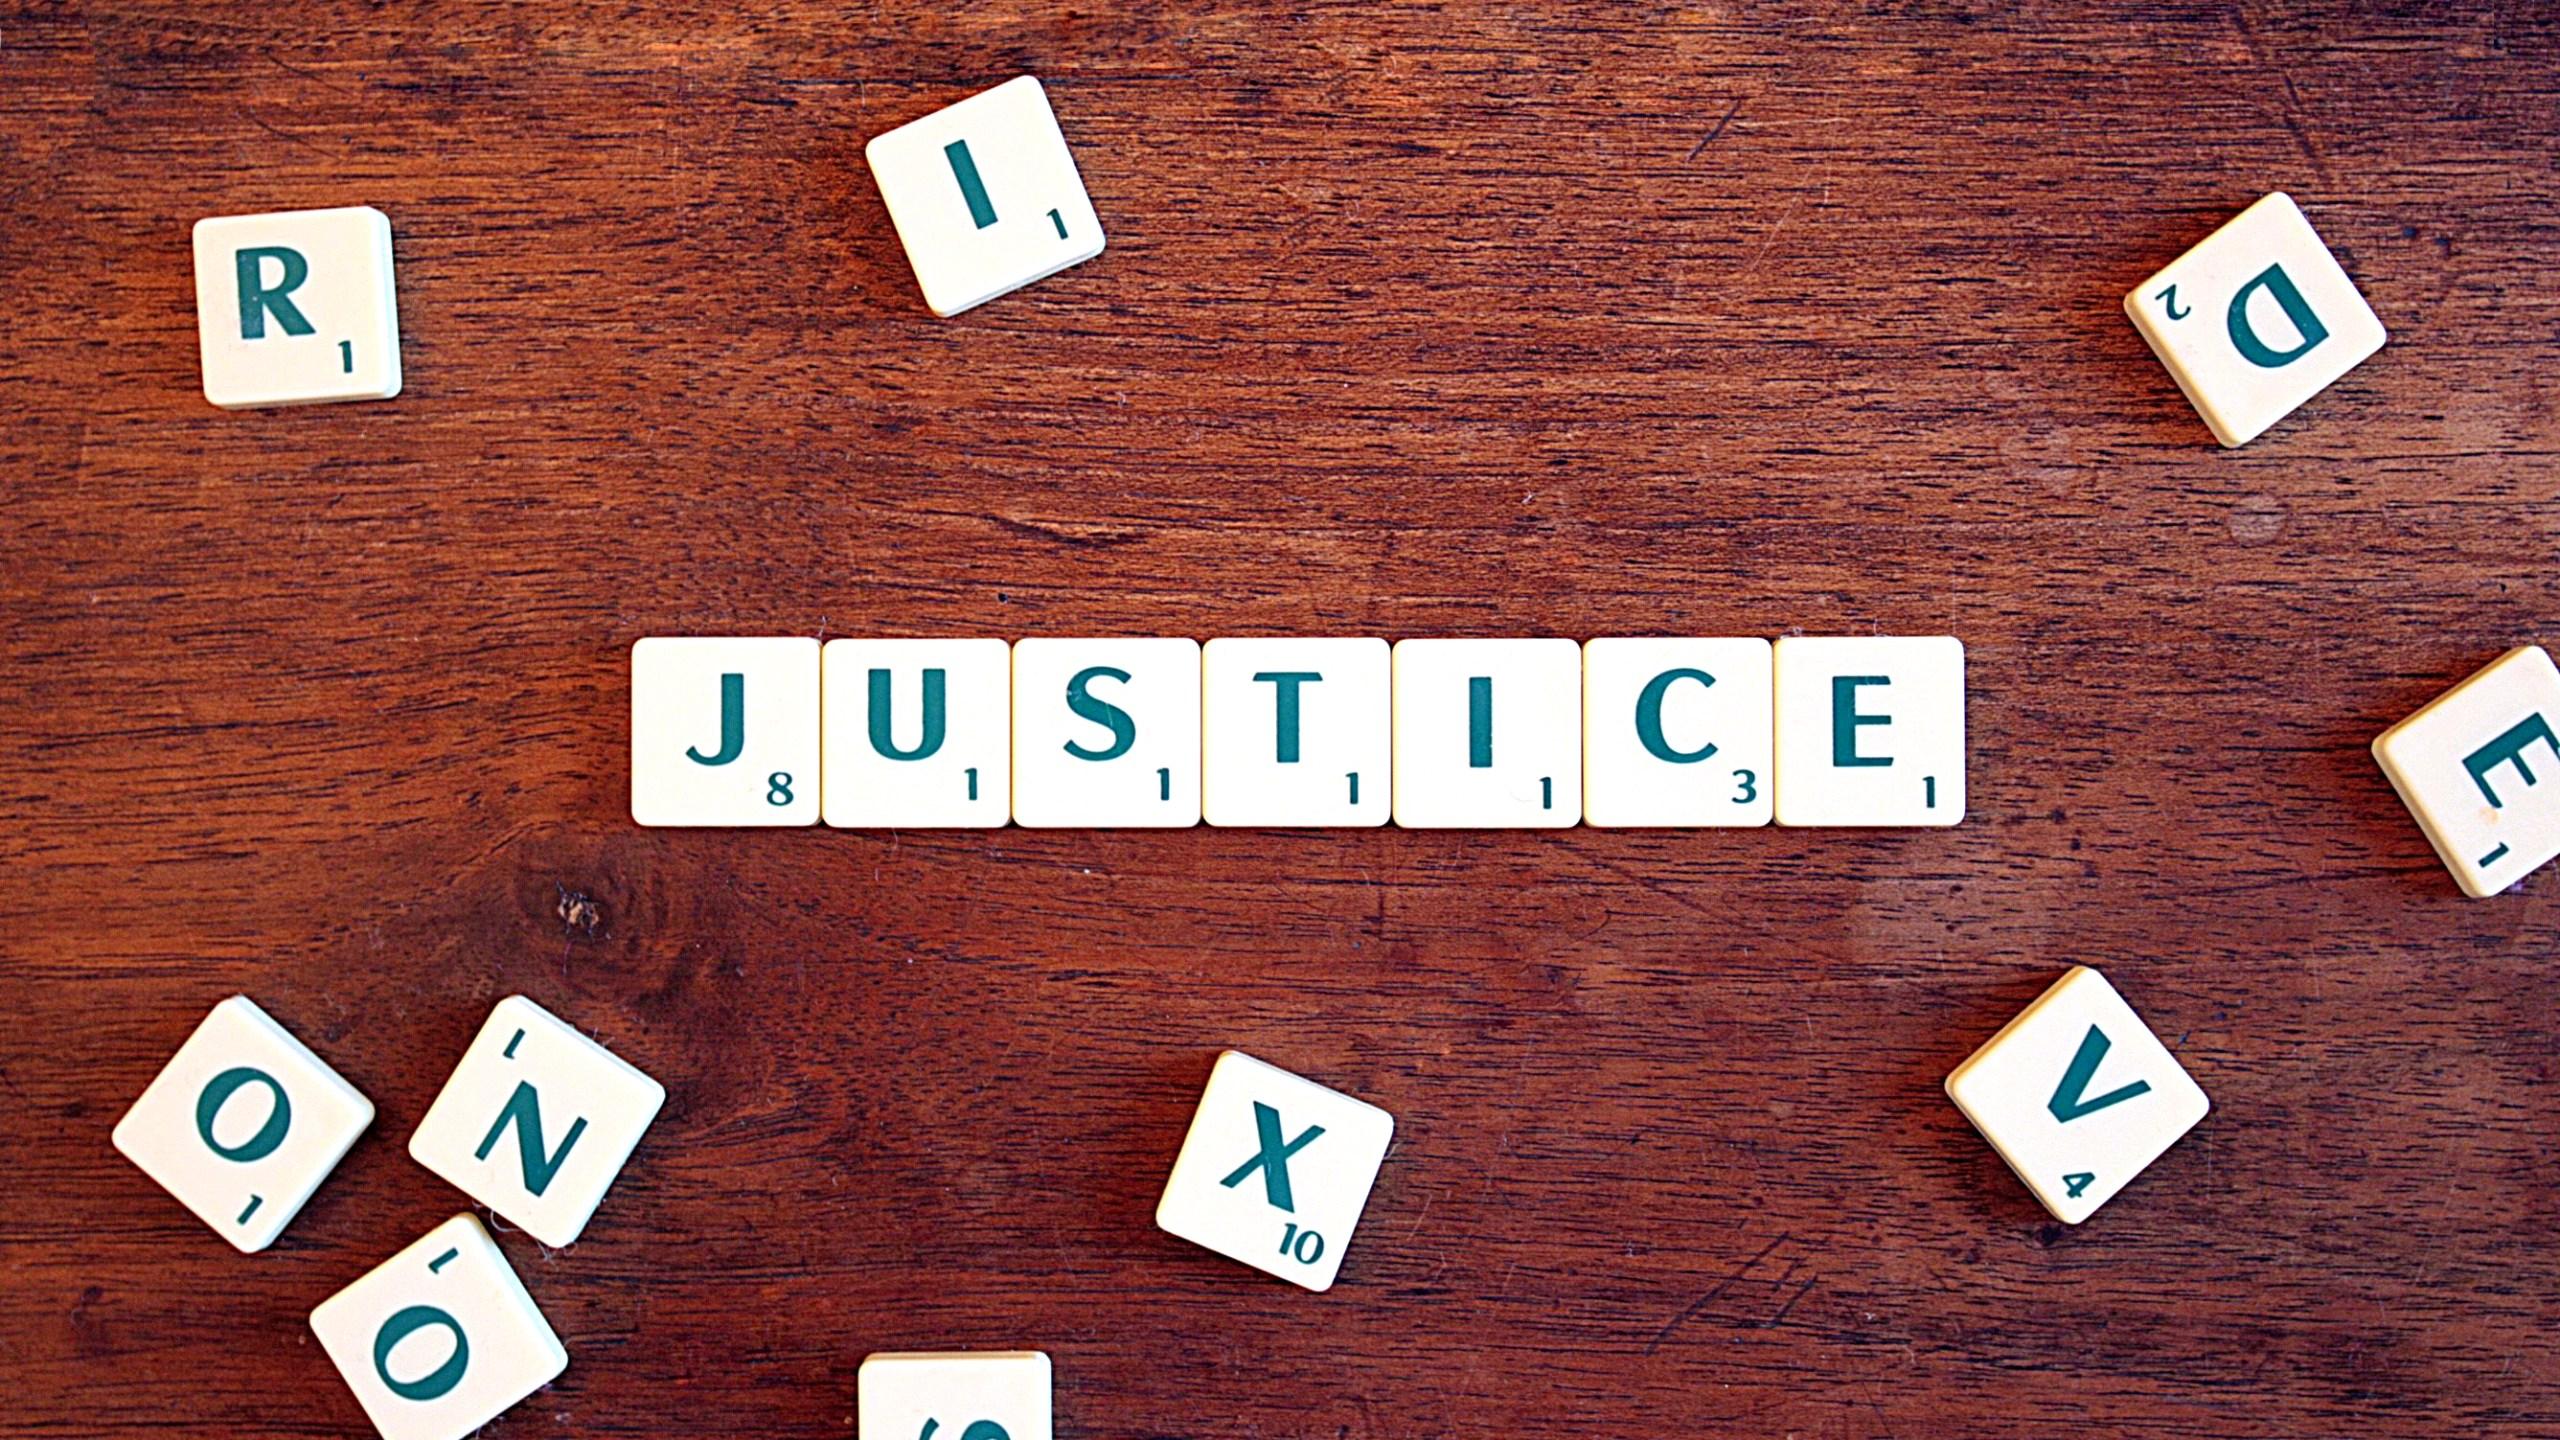 """Justice"" in Scrabble tiles"